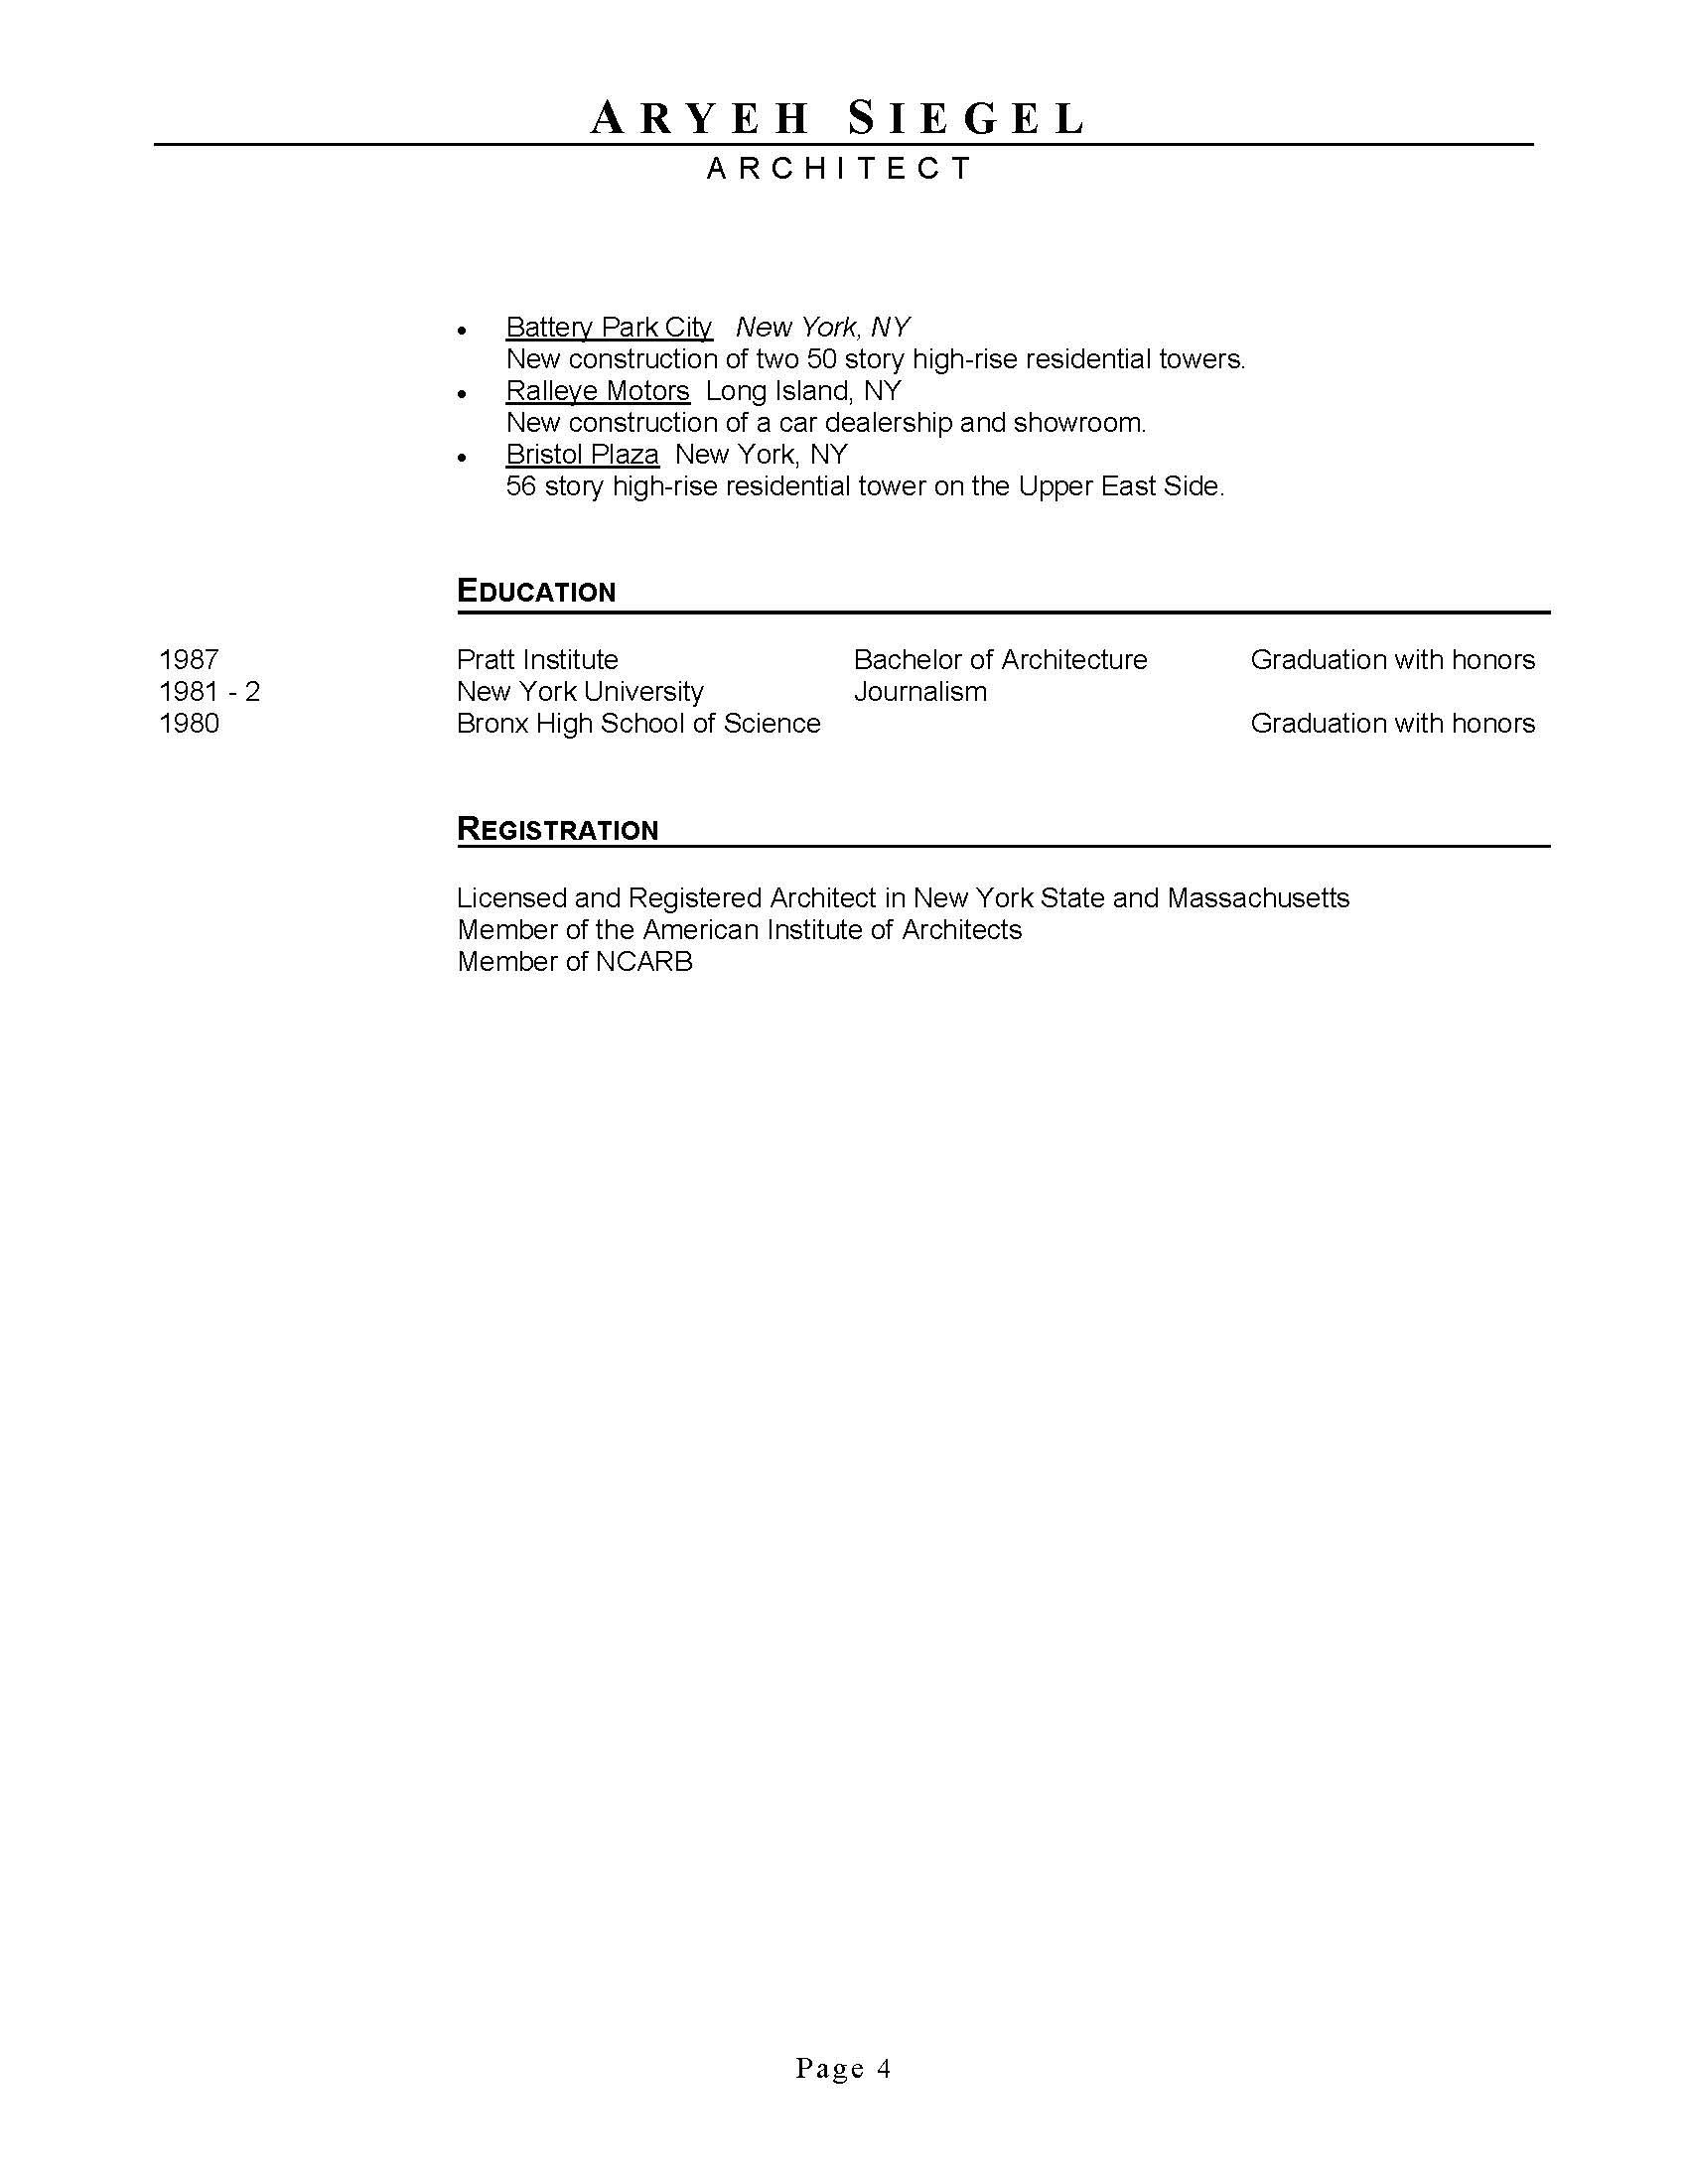 Master Resume_130725_Page_4.jpg